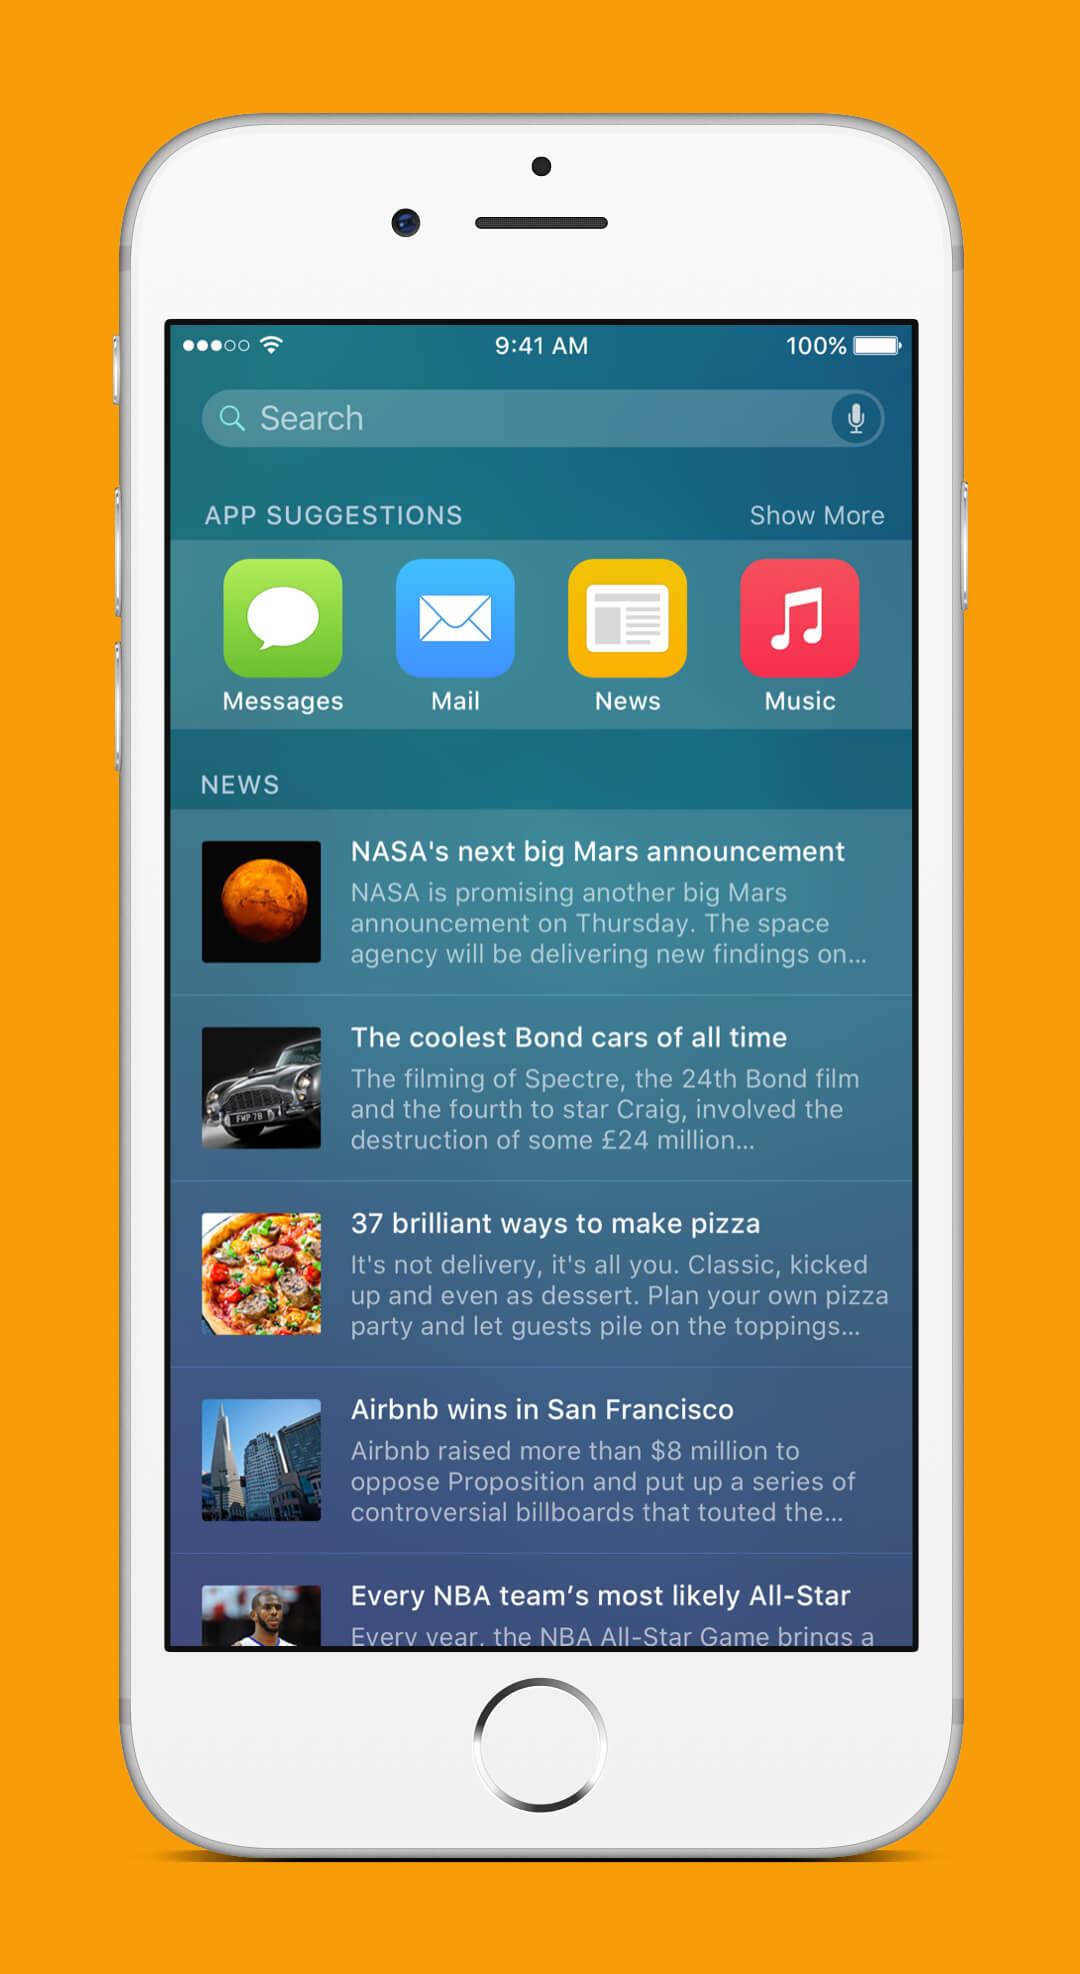 iOS 9 Redesign - Spotlight Screen